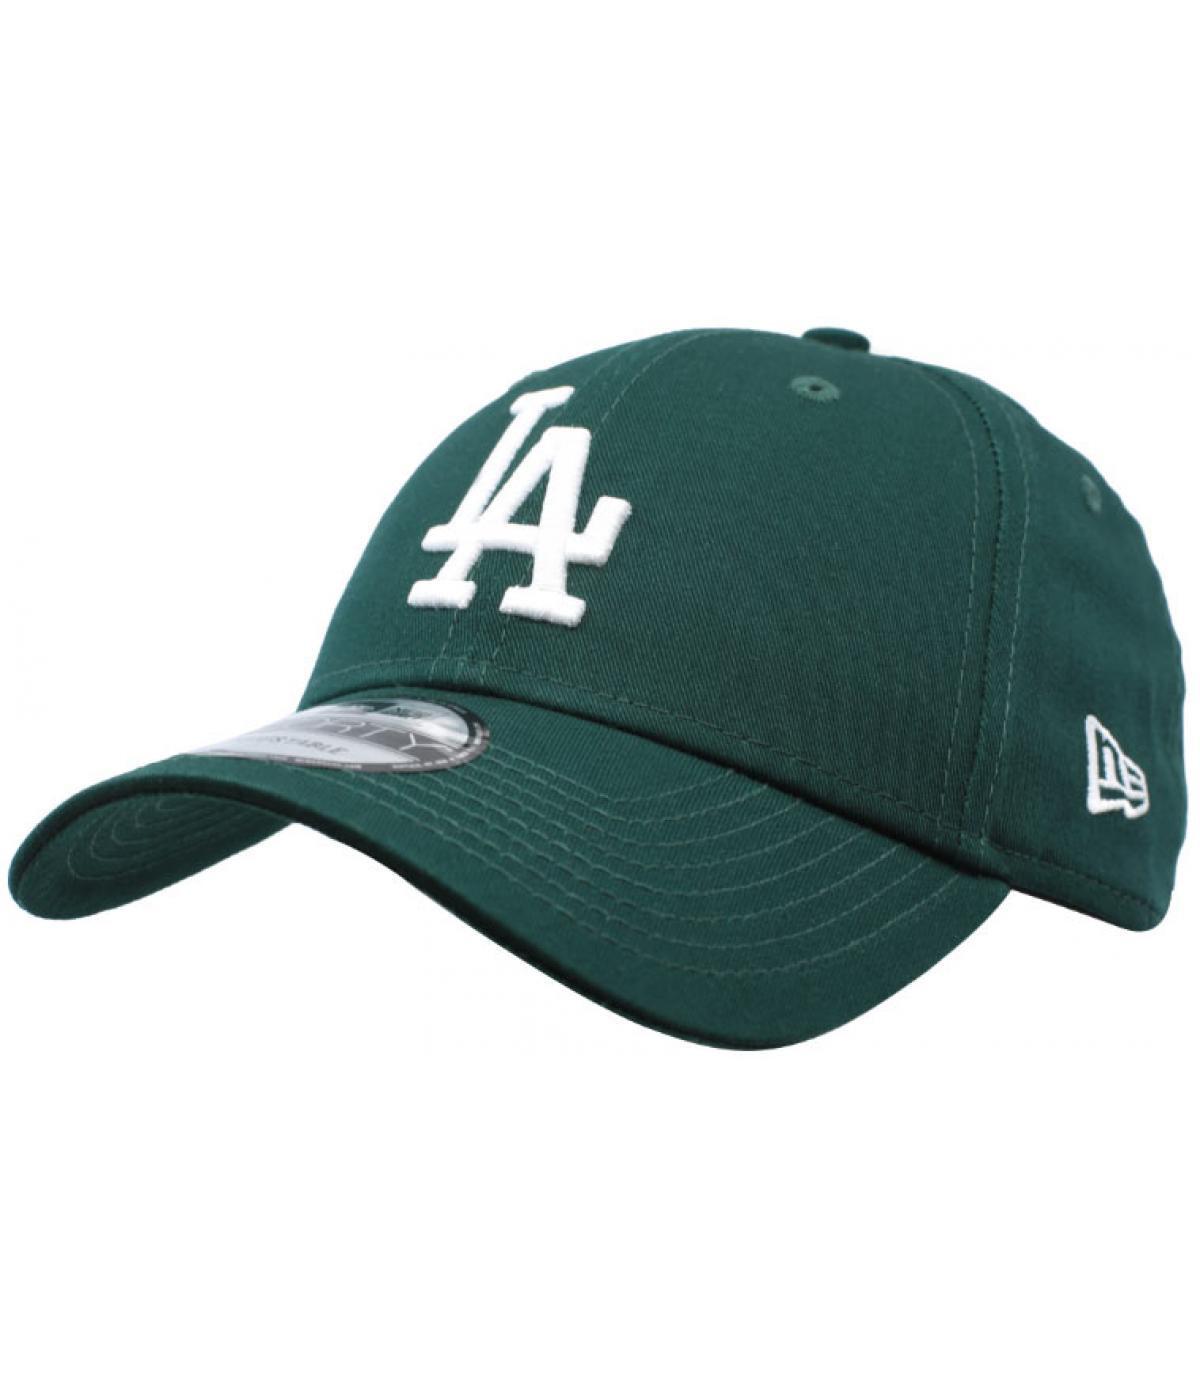 Details League Ess 9Forty LA dark green - afbeeling 2